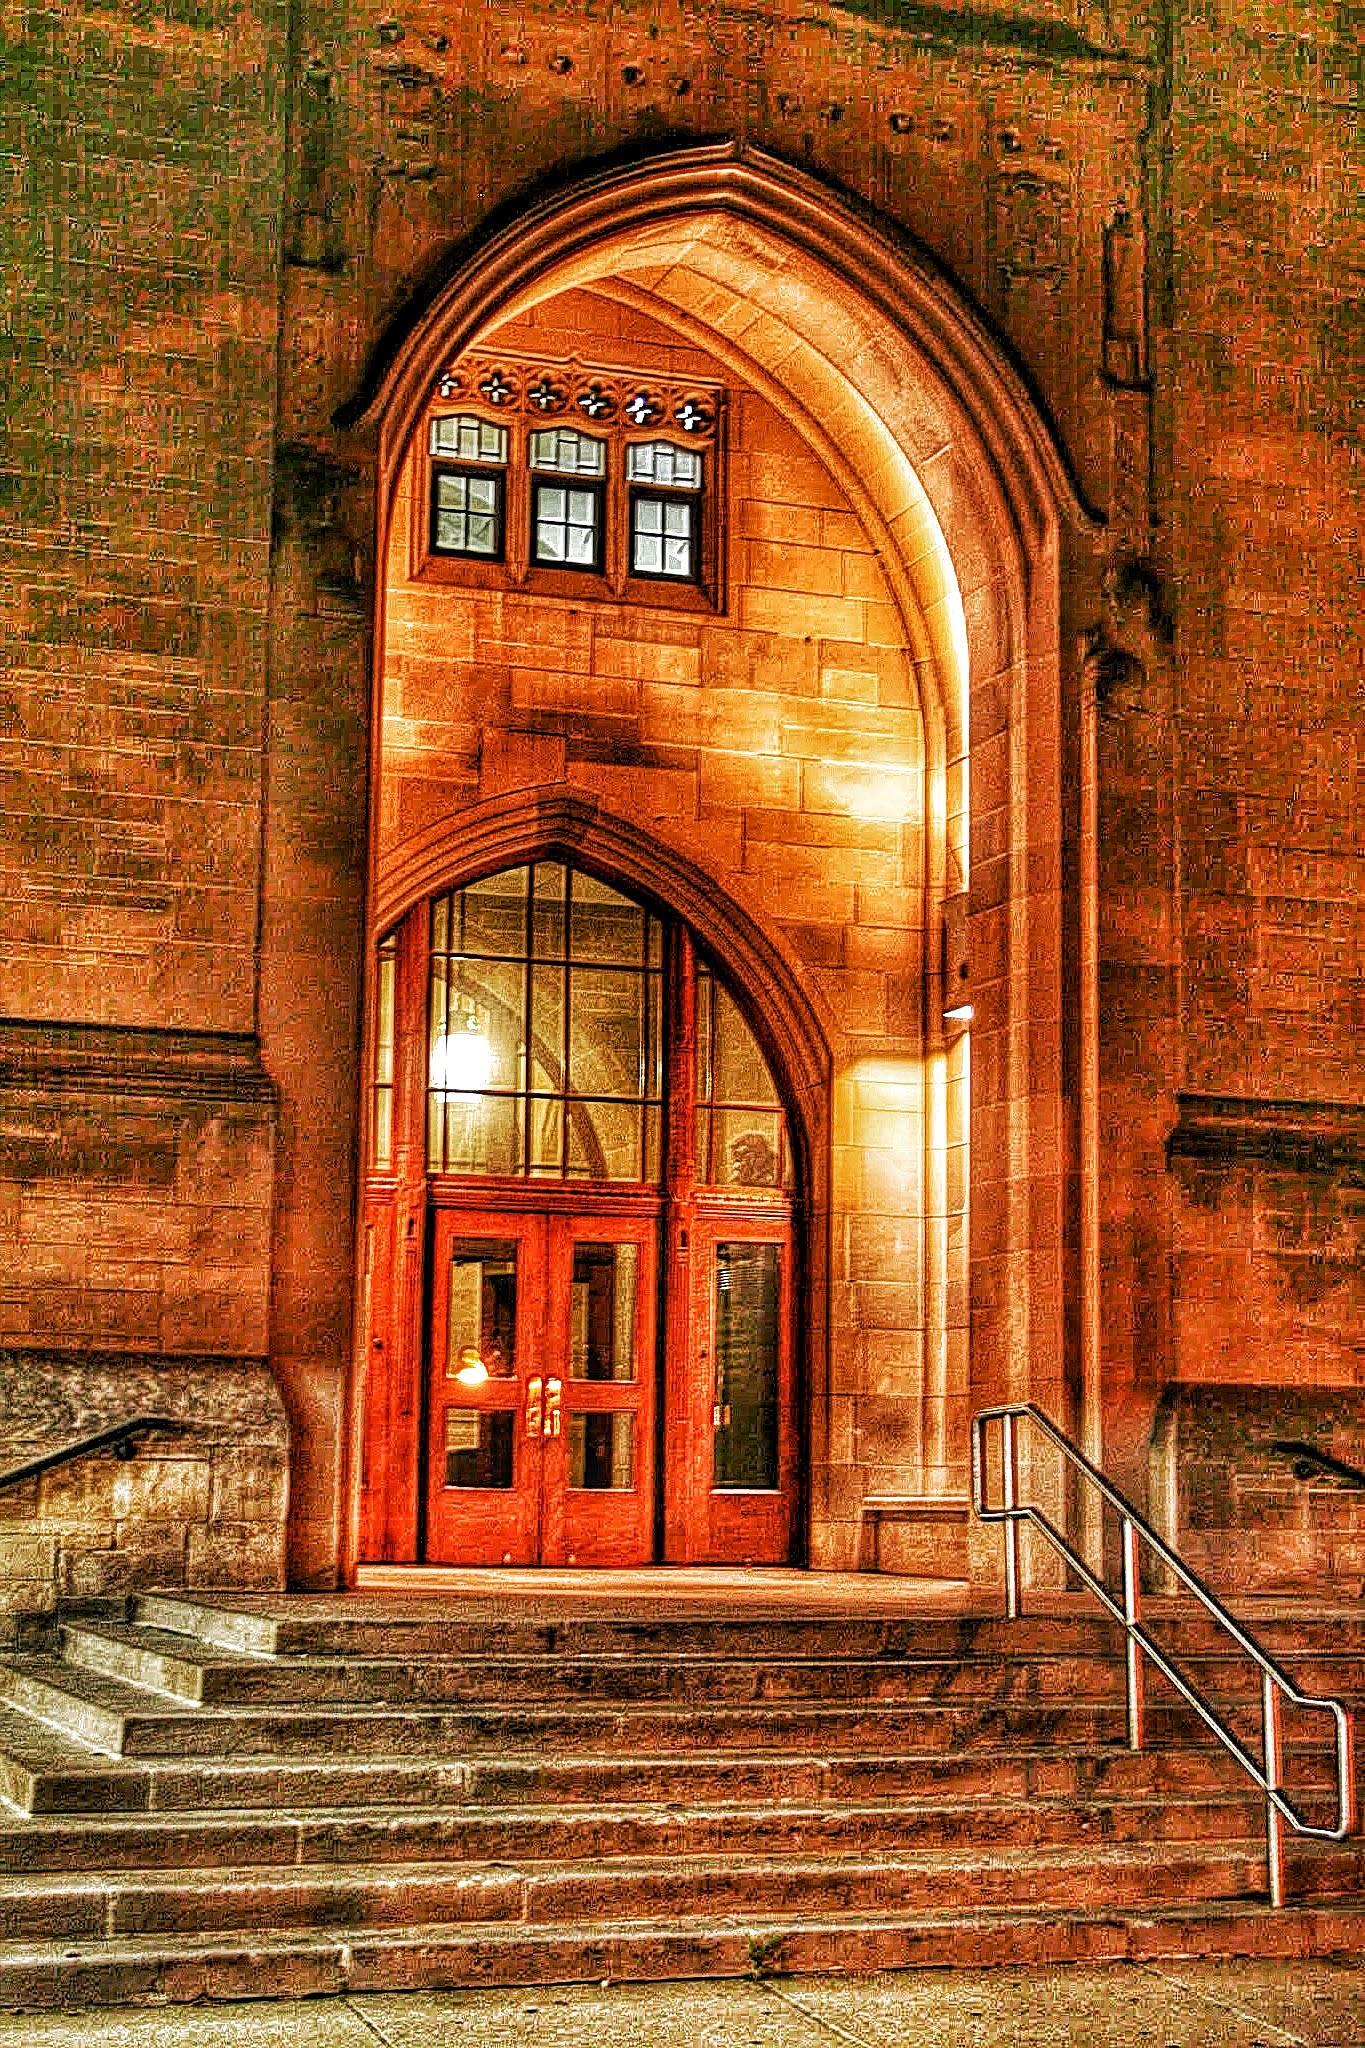 Indiana University by drewk